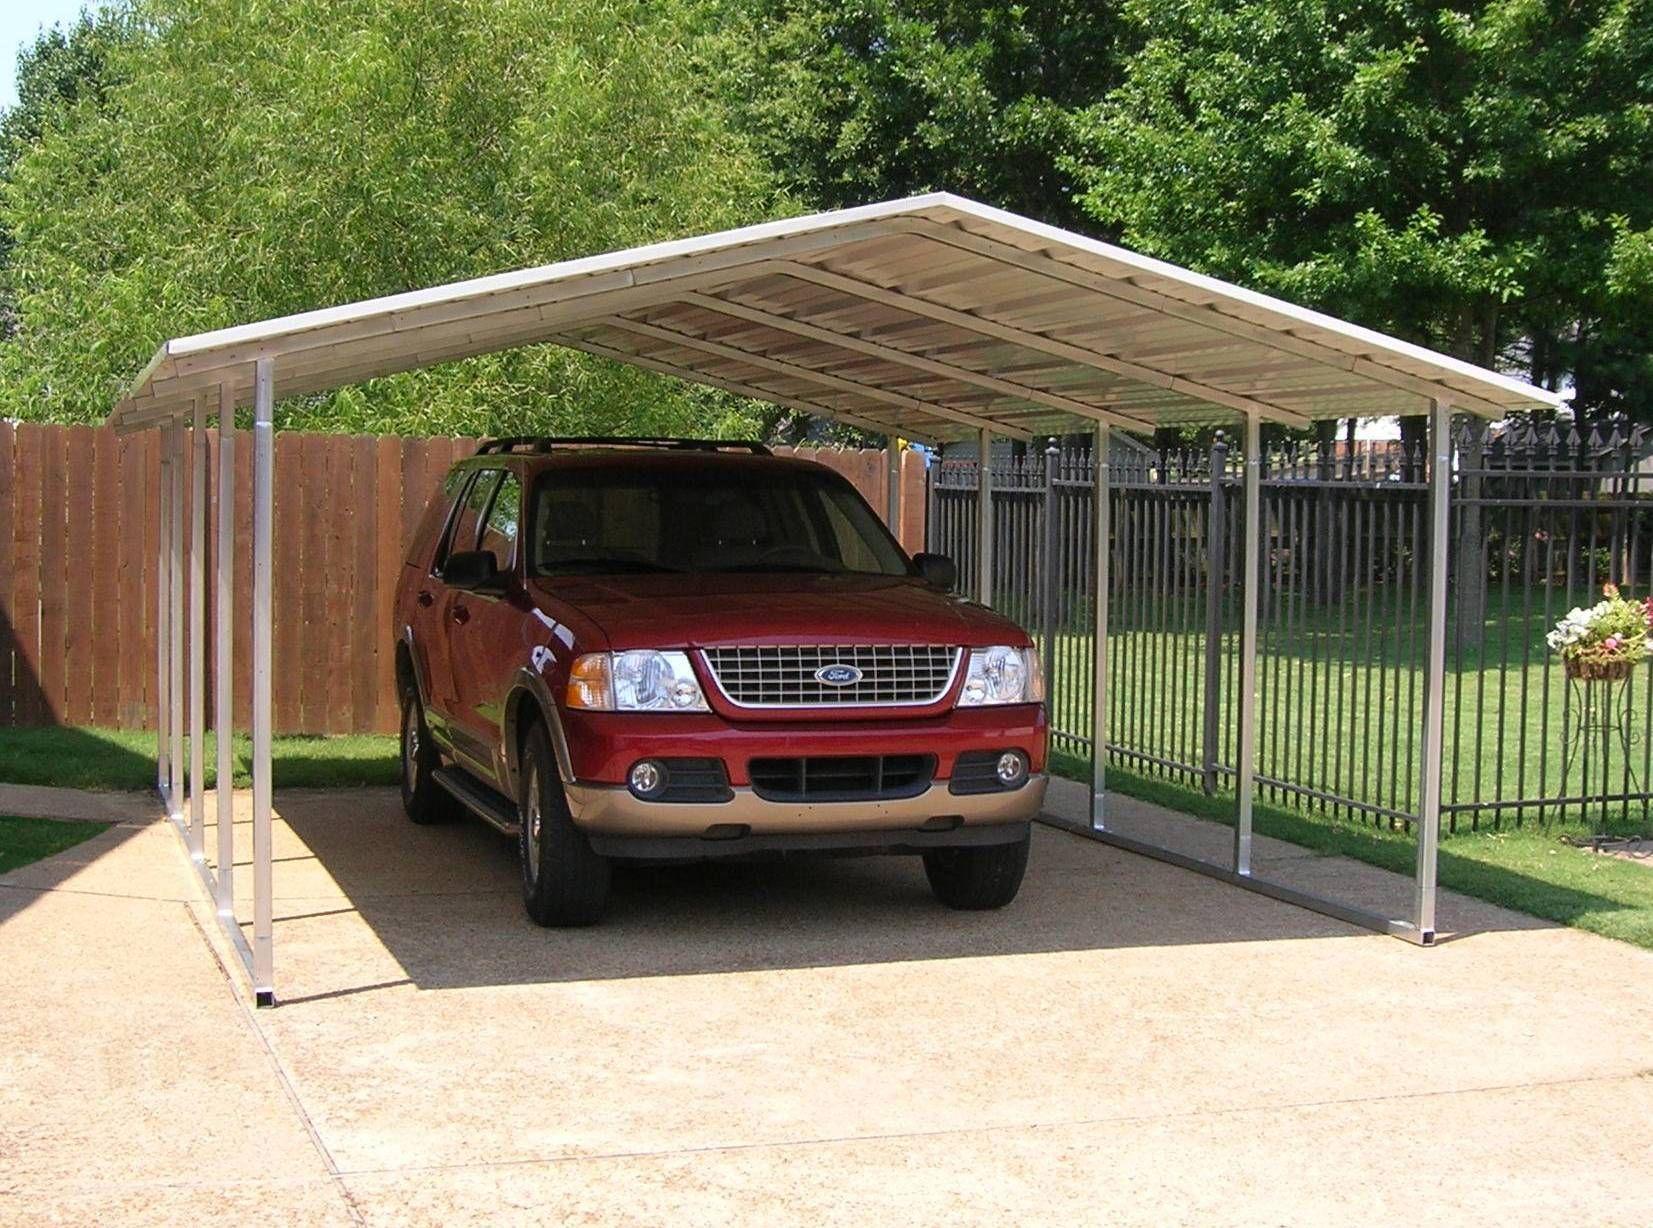 Suburban Series Carports Feature Horizontal Application Of Sheet Metal Roof Panels With A Contemporary A Frame D Carport Covers Steel Carports Aluminum Carport